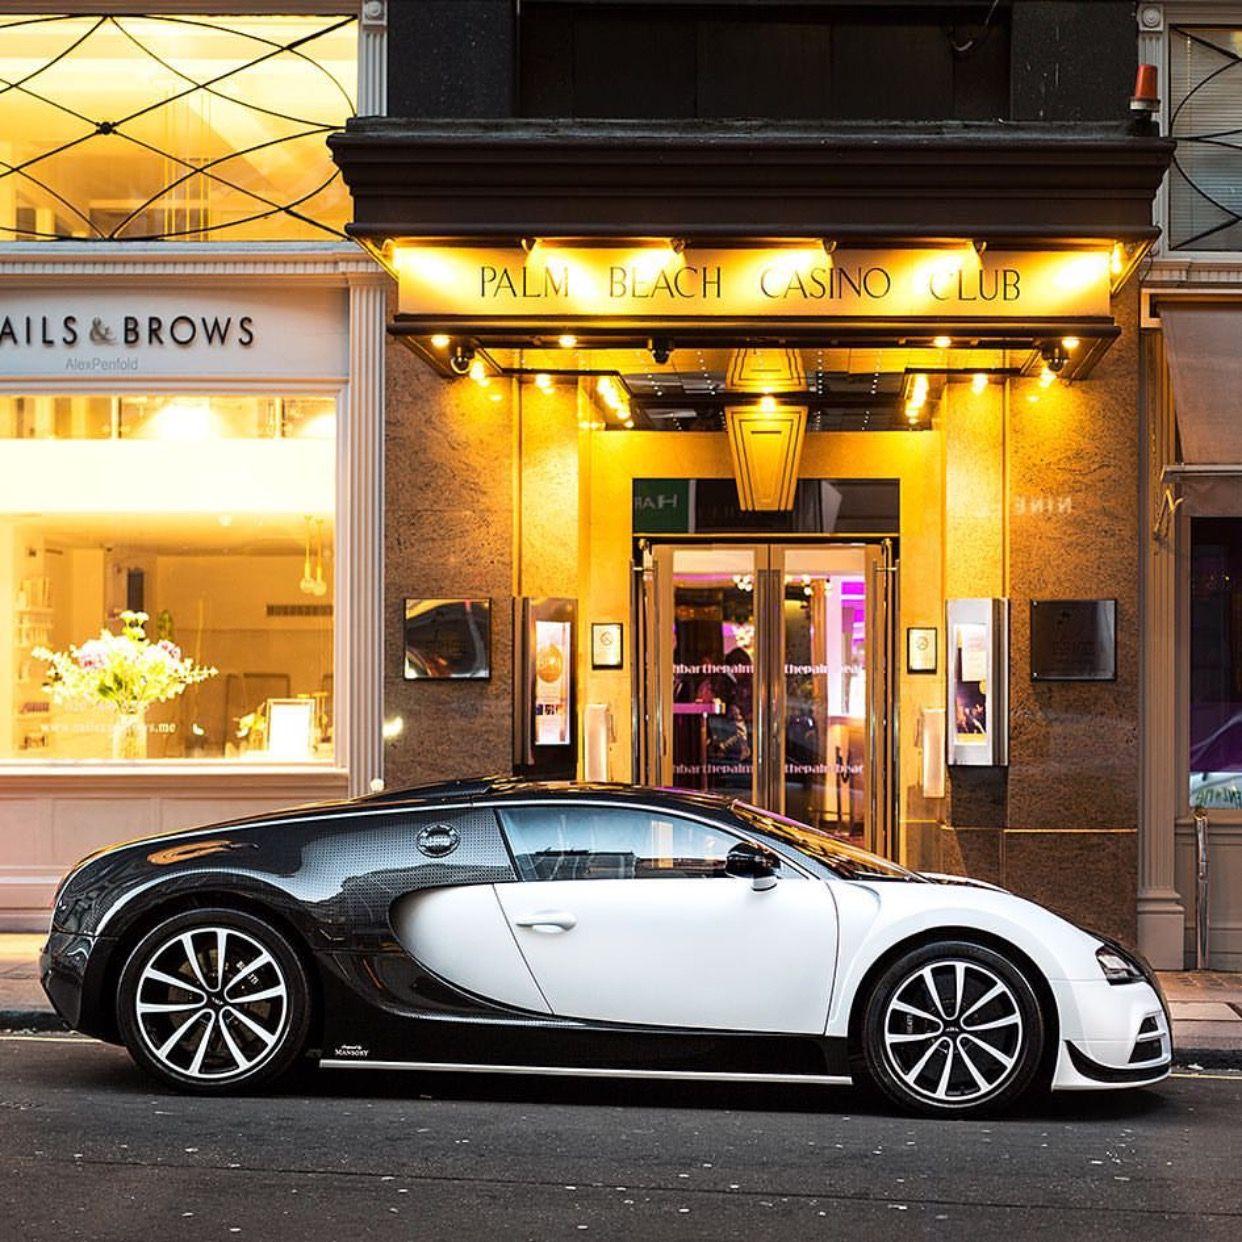 Custom Bugatti Veyron Super Rear View: Mansory Vivere Painted In White W/ Custom Weave Gray